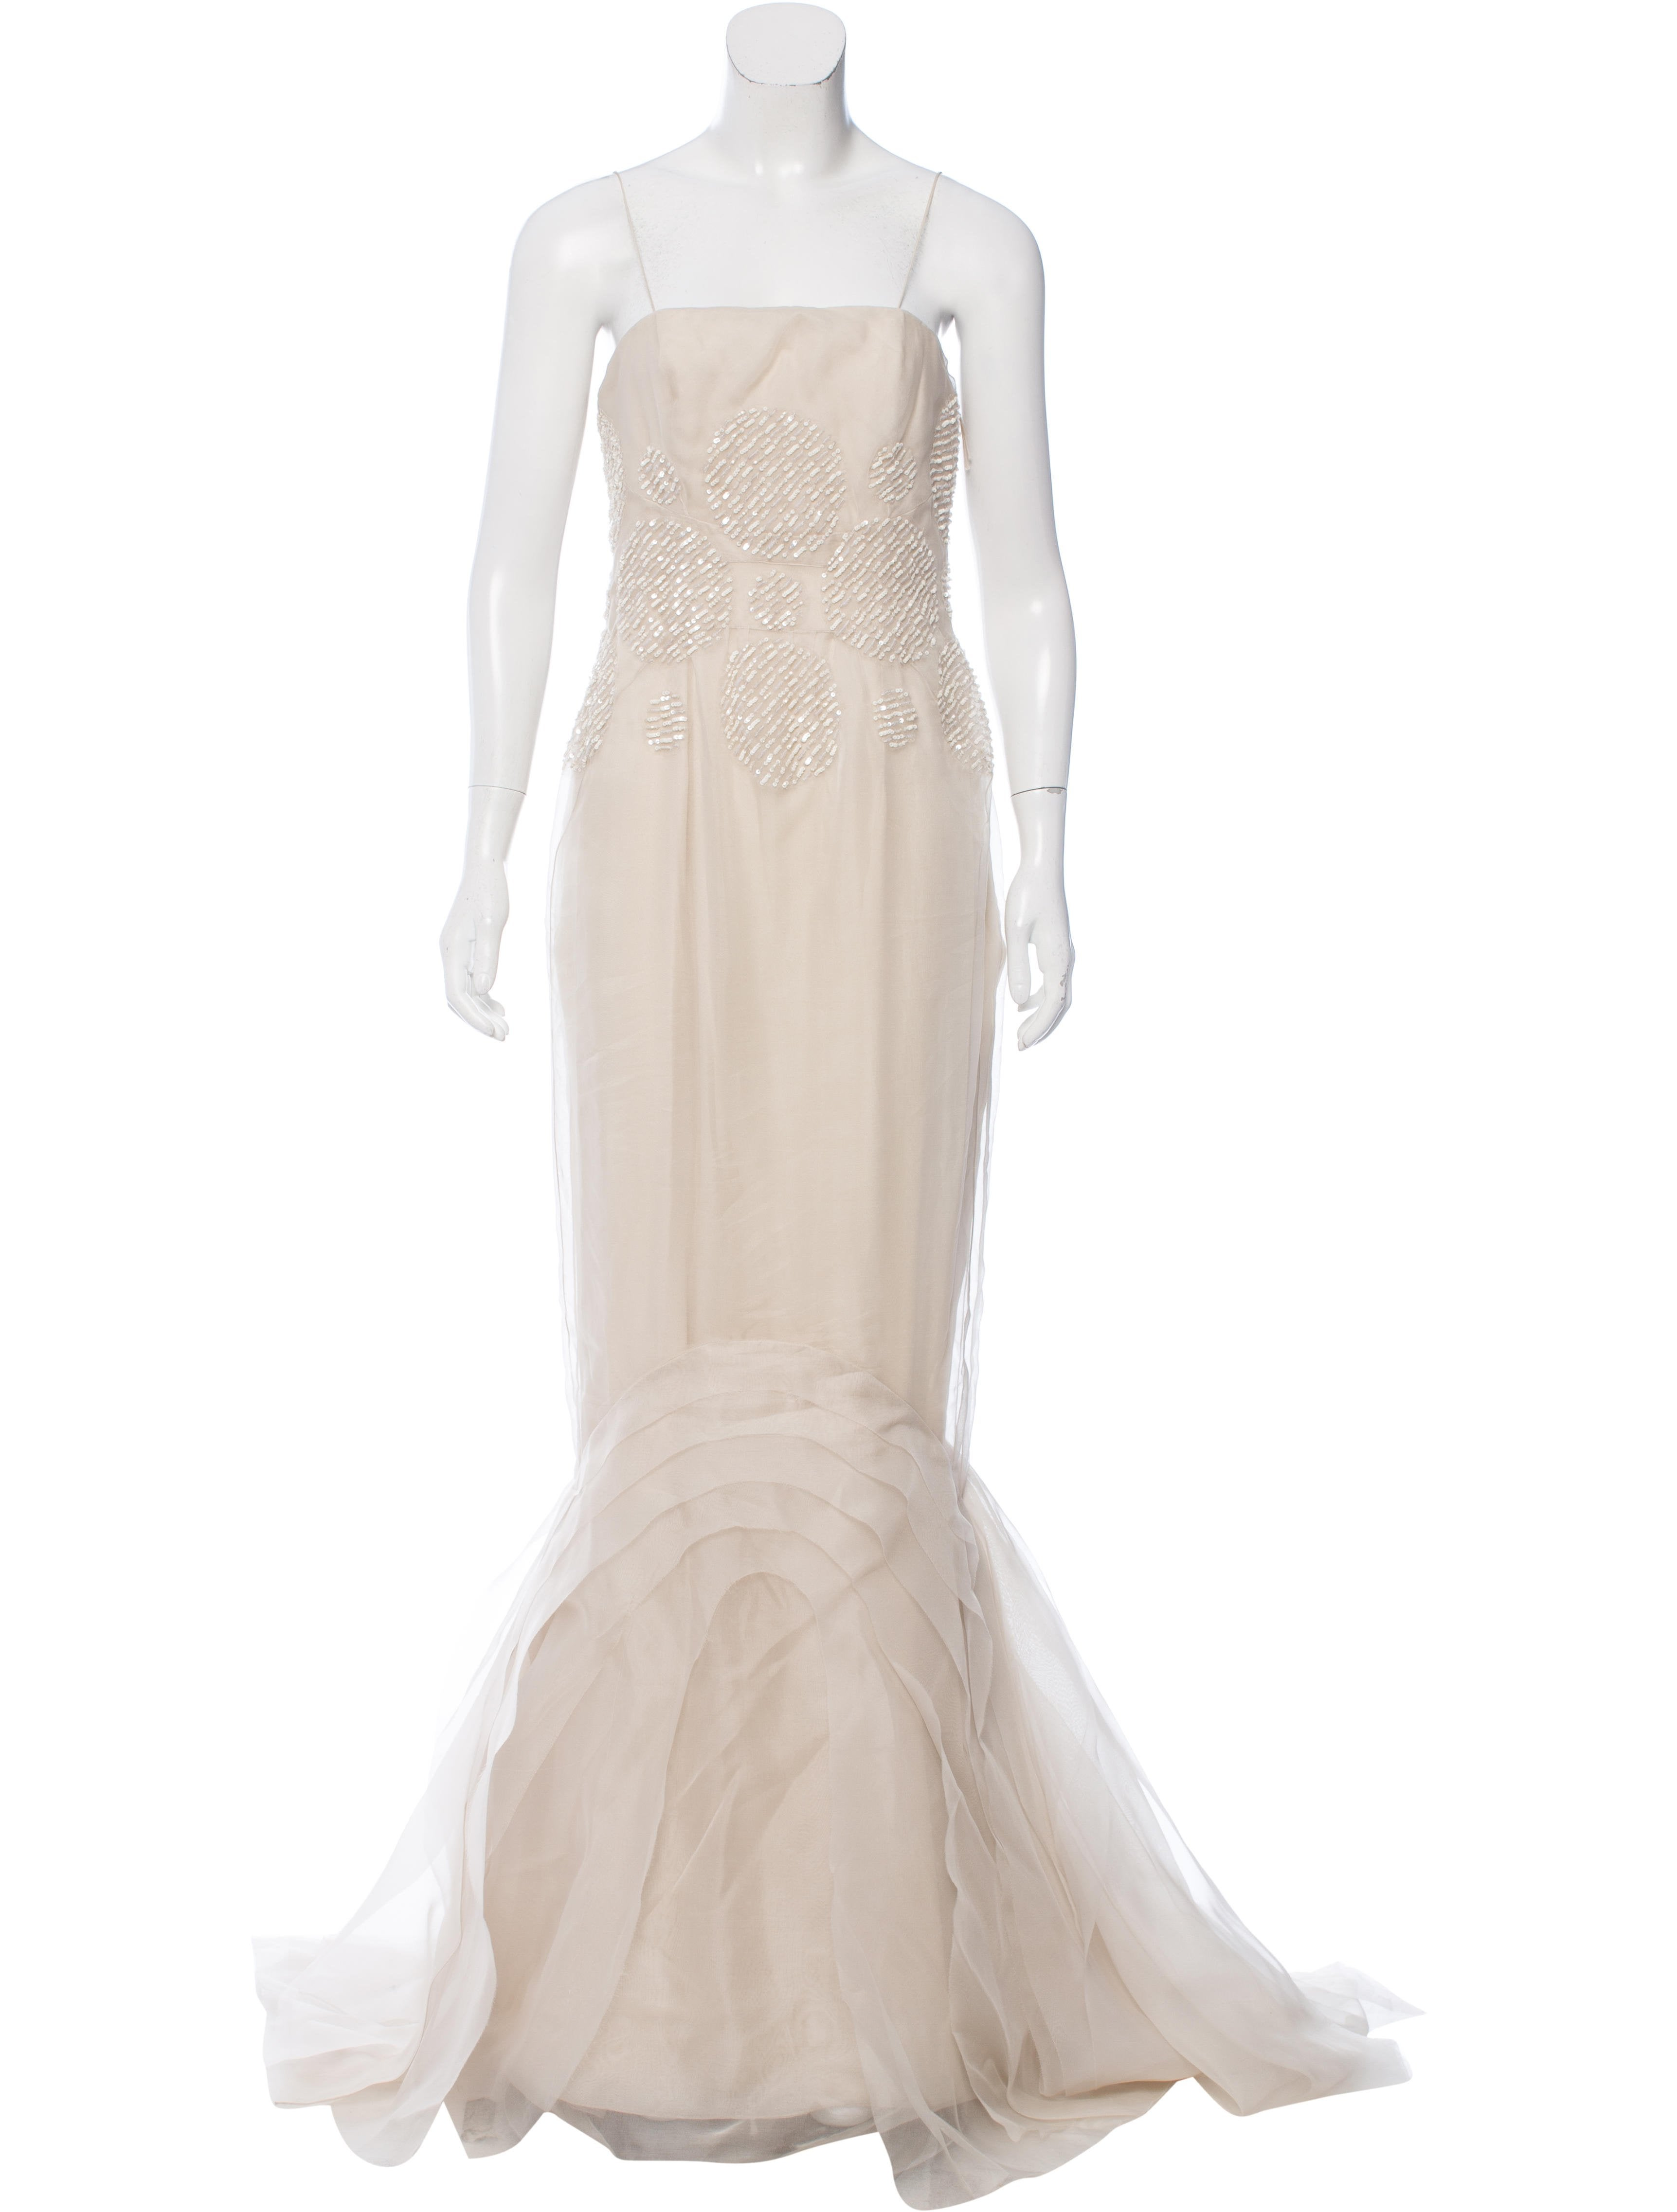 J. Mendel Embellished Evening Dress - Clothing - JME24709 | The RealReal